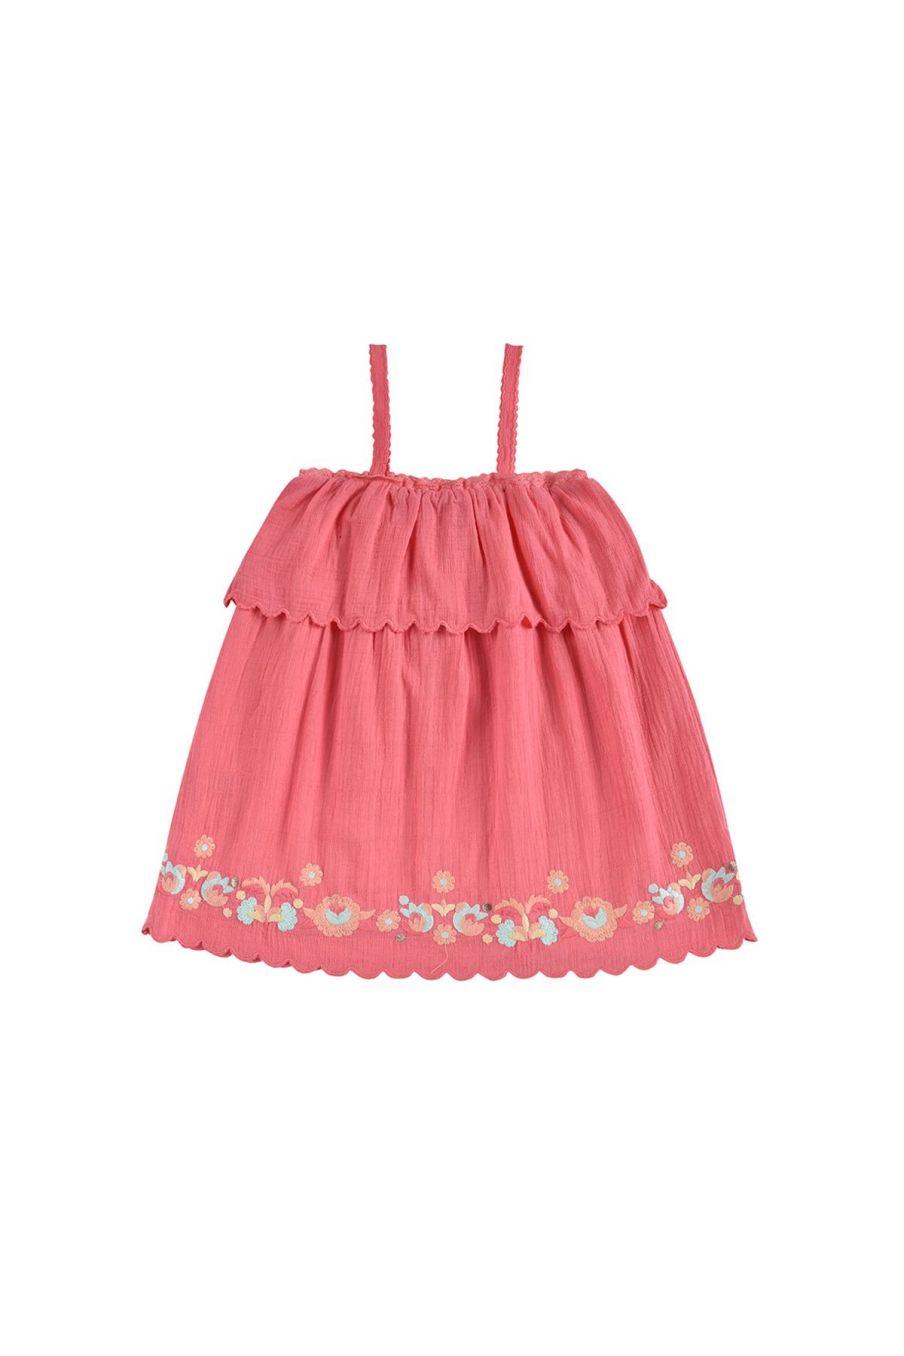 boheme chic vintage robe fille solane framboise